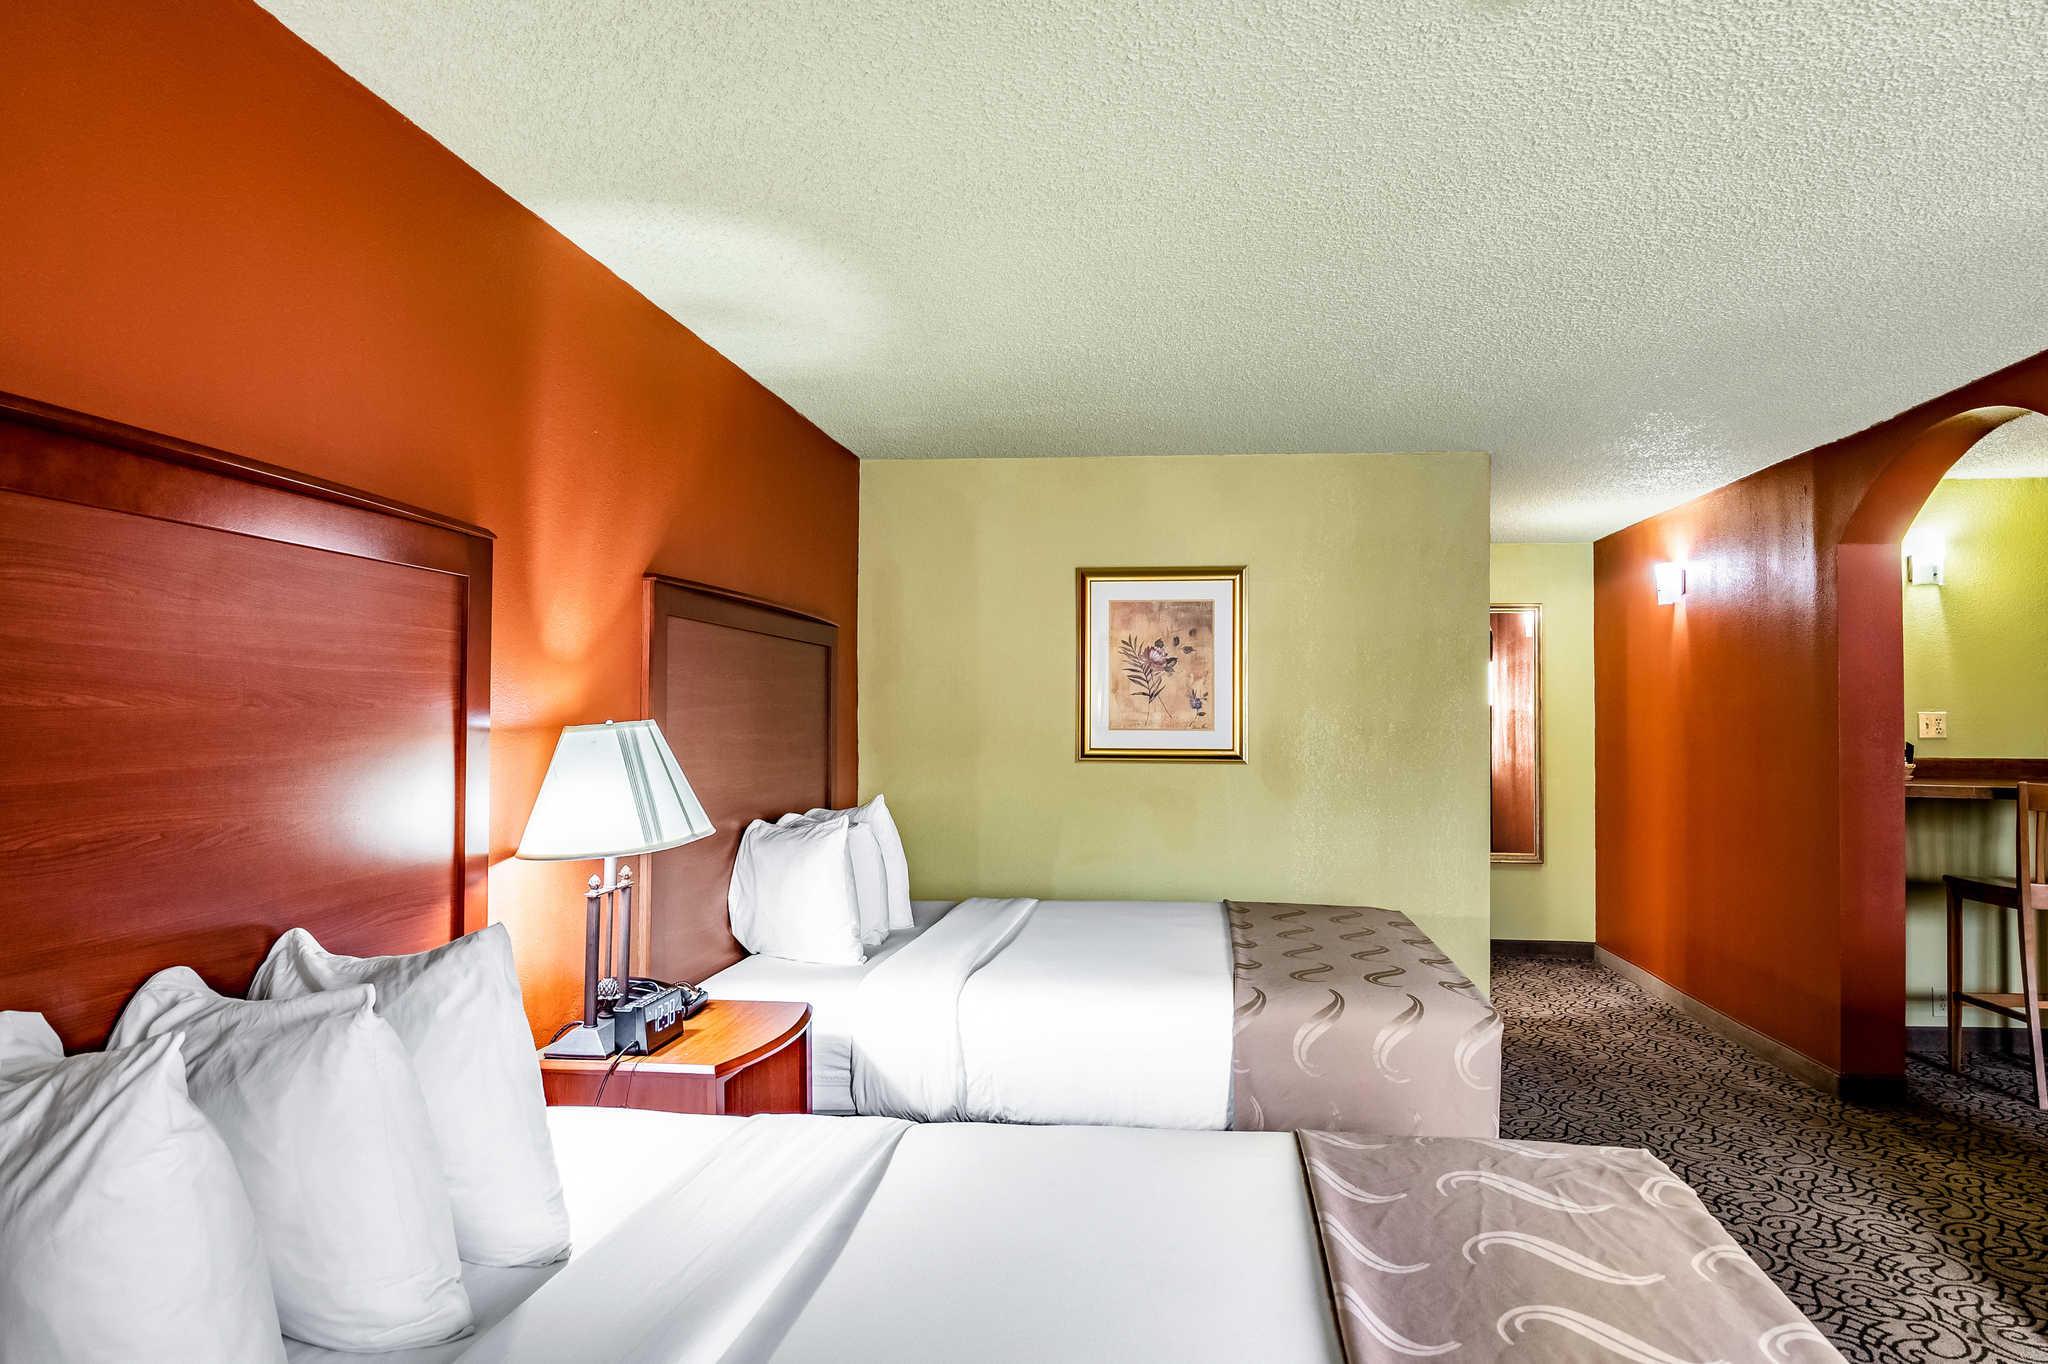 Quality Inn image 13